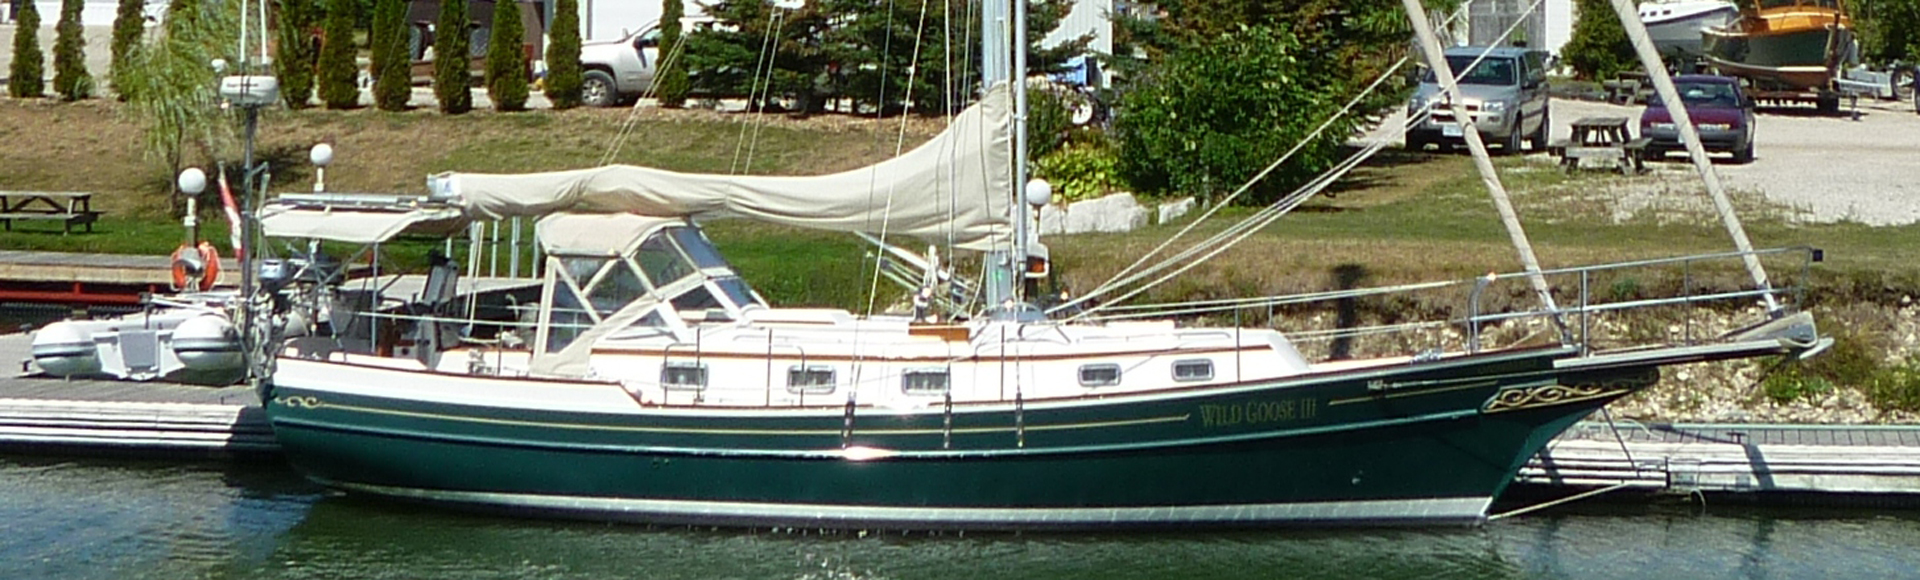 "1997 Gozzard 36E Hull #77 ""Wild Goose III"""